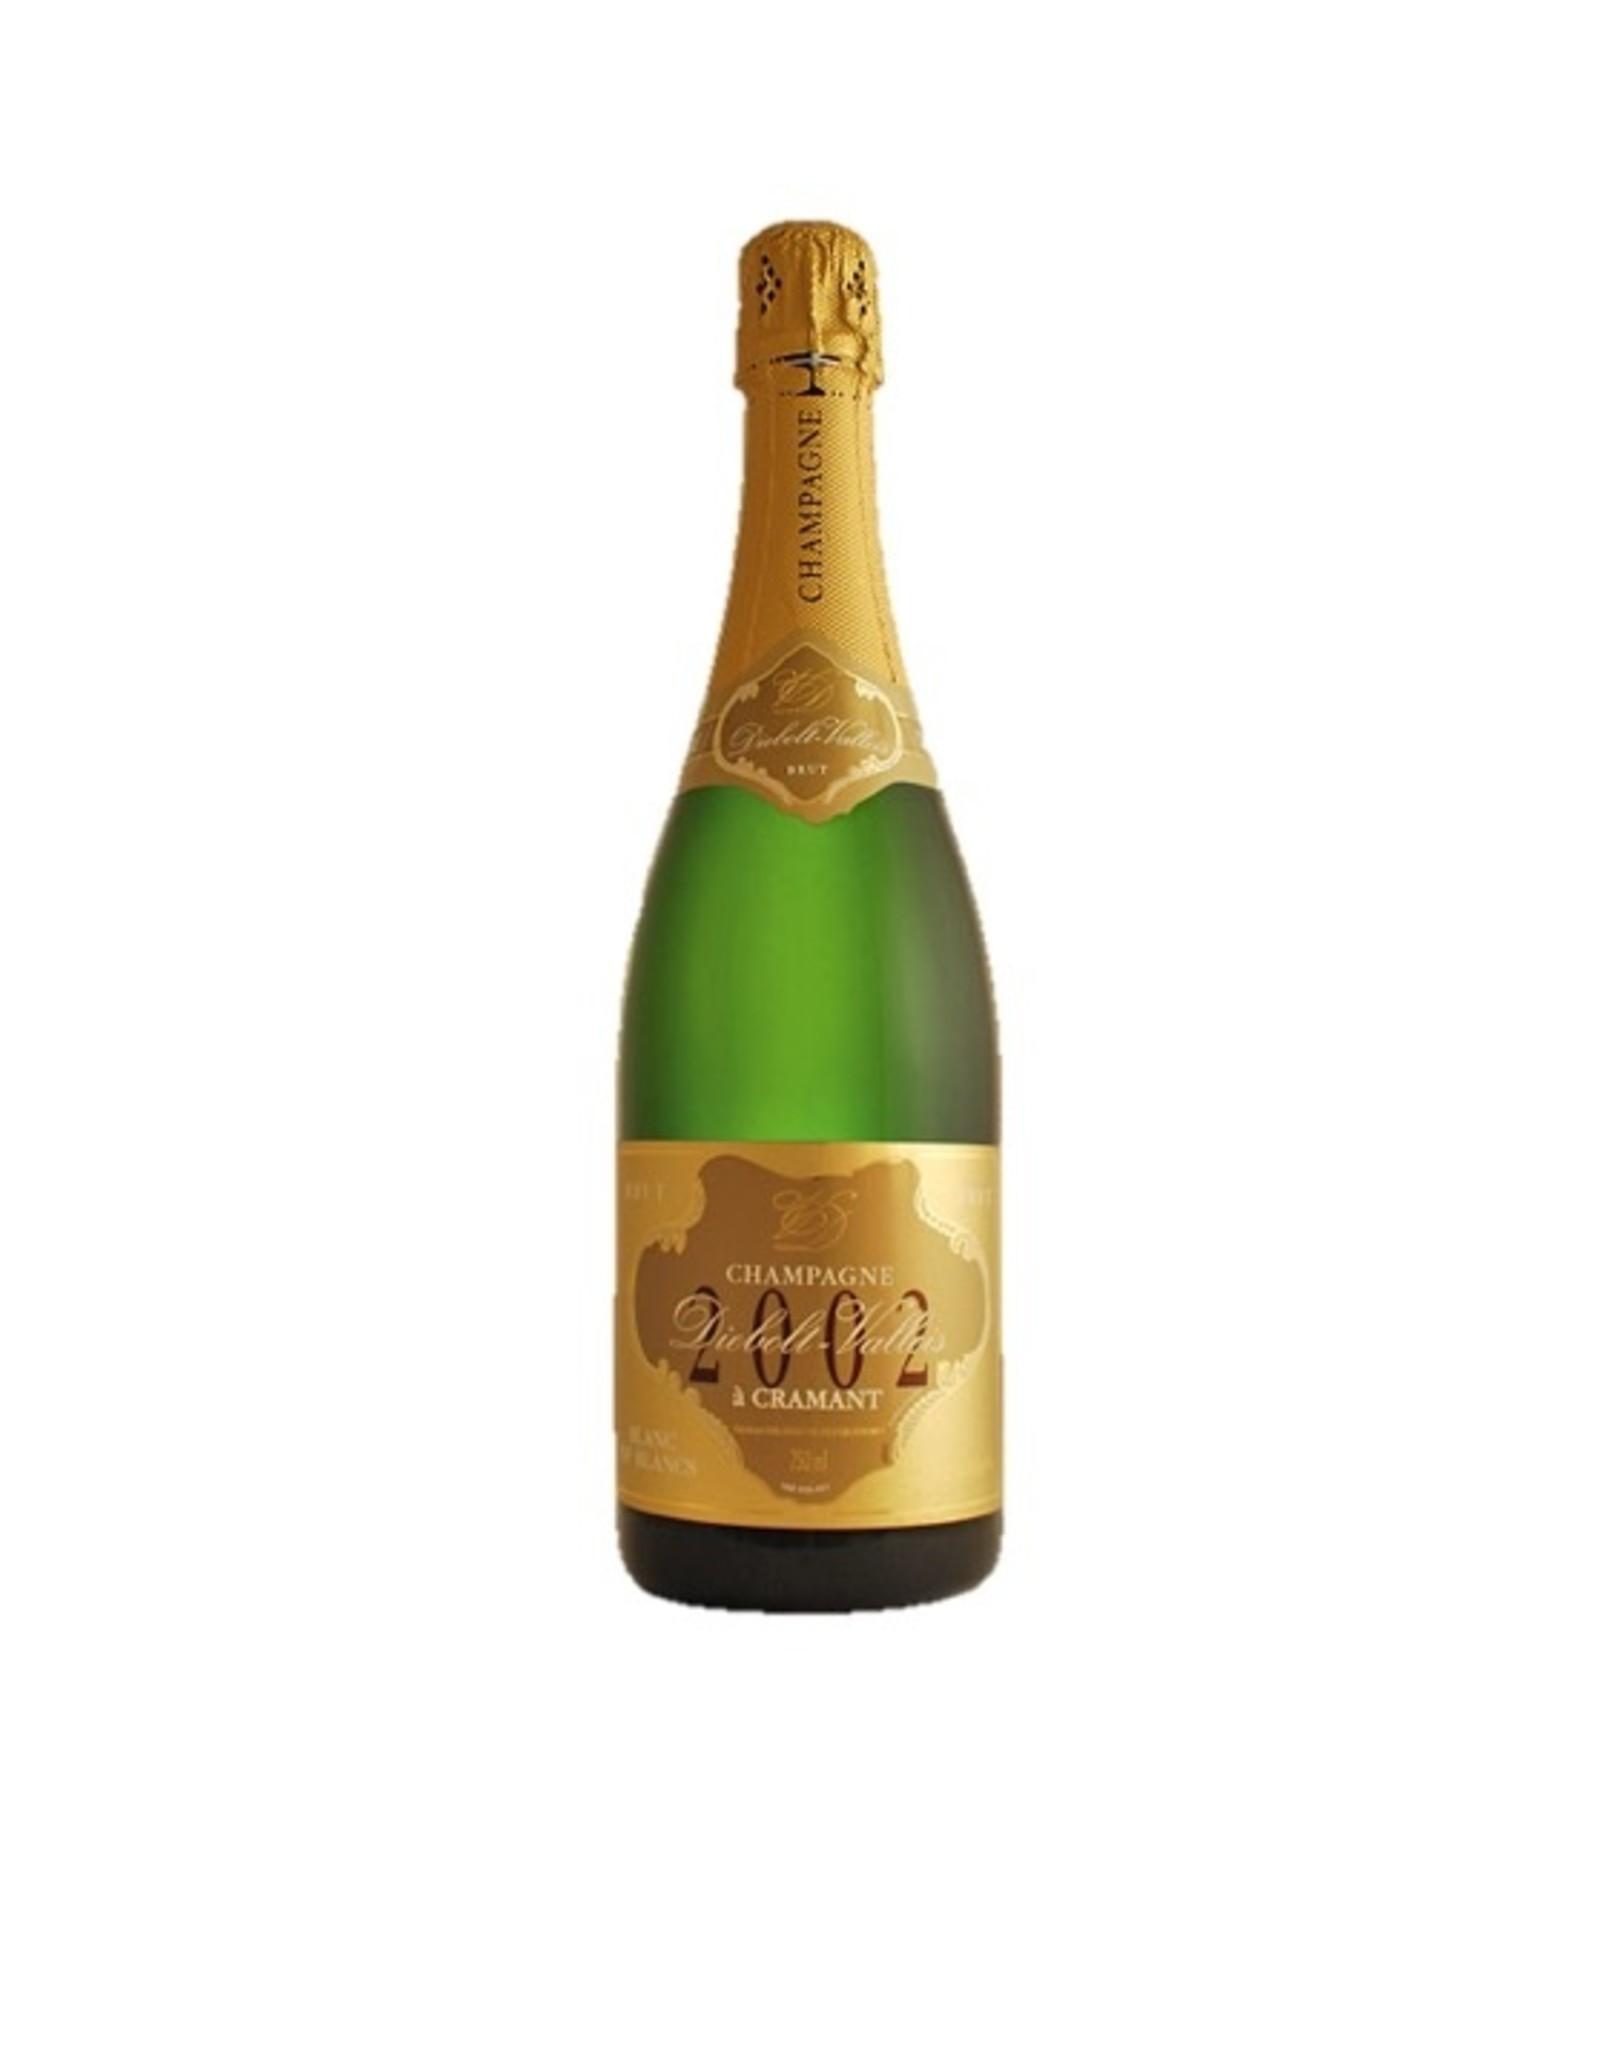 Diebolt-Vallois Champagne Diebolt Vallois Millesime 2013